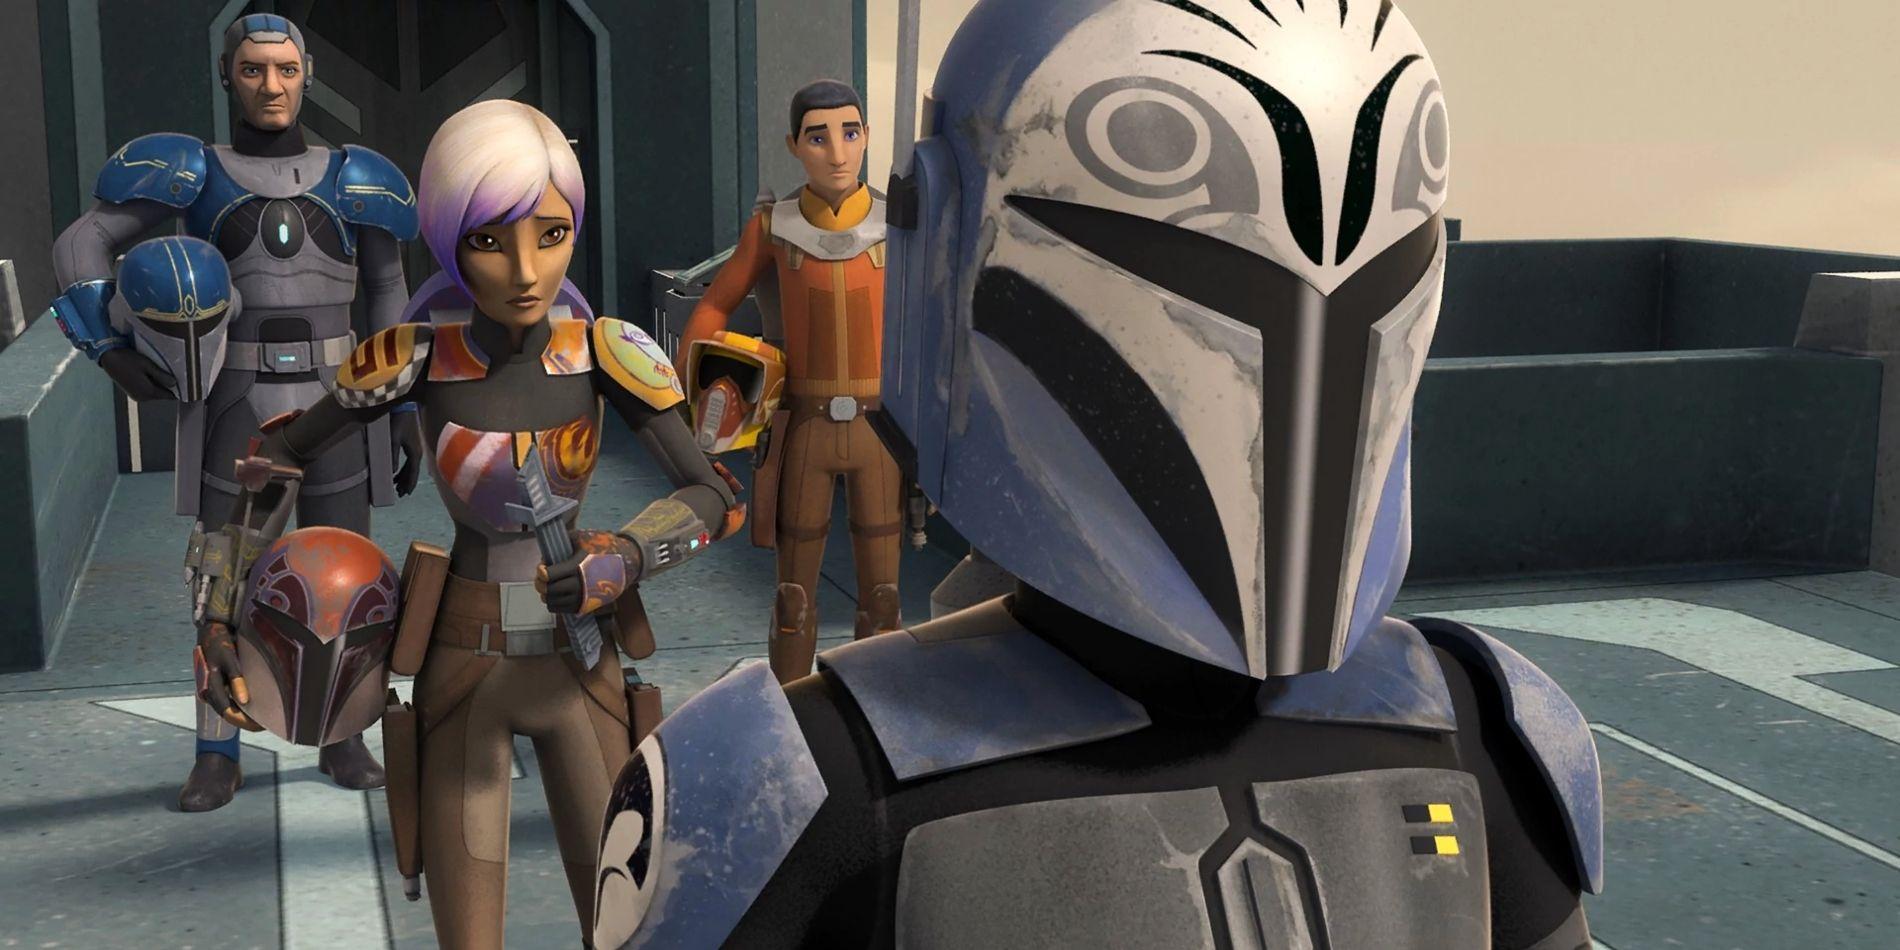 How Star Wars Rebels Season 4 Episode 1 Set Up The Last